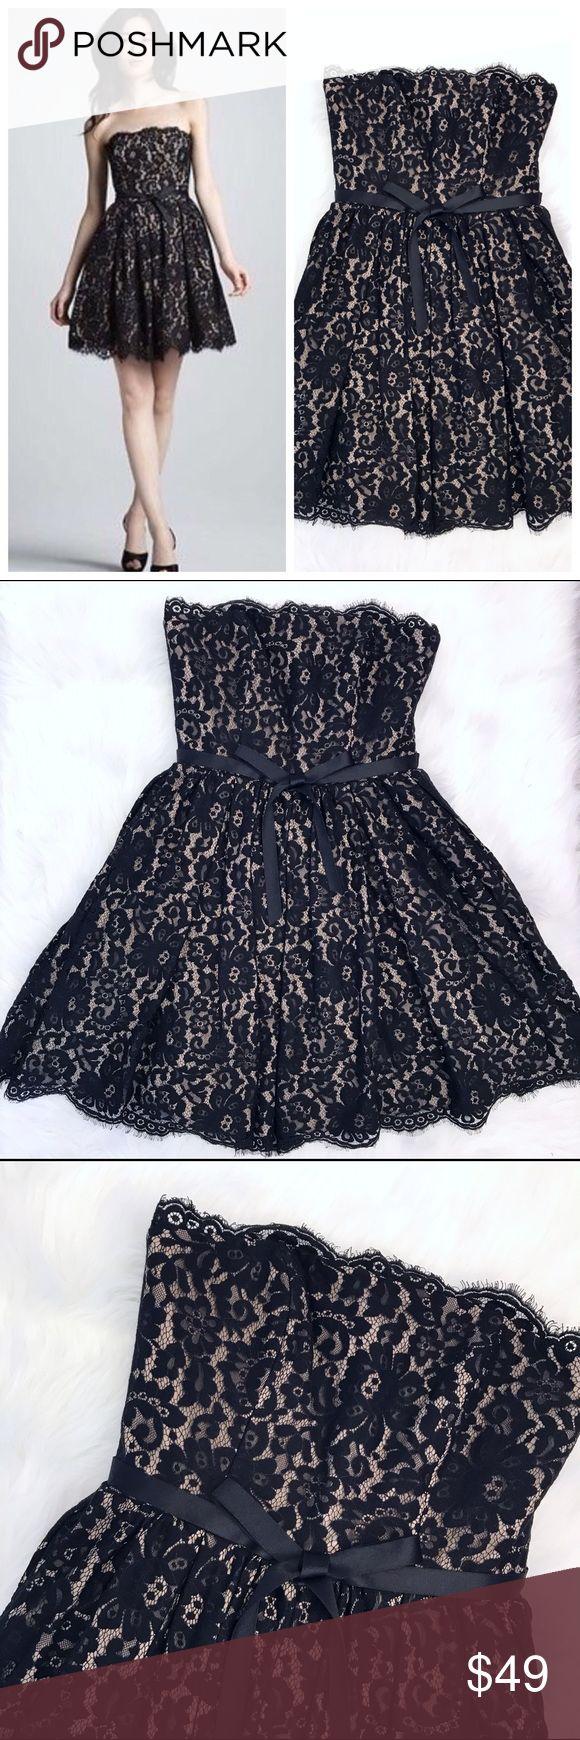 Black dress neiman marcus - Neiman Marcus Black Lace Cocktail Prom Dress 4 Target Neiman Marcus Collaboration With Robert Rodriguez